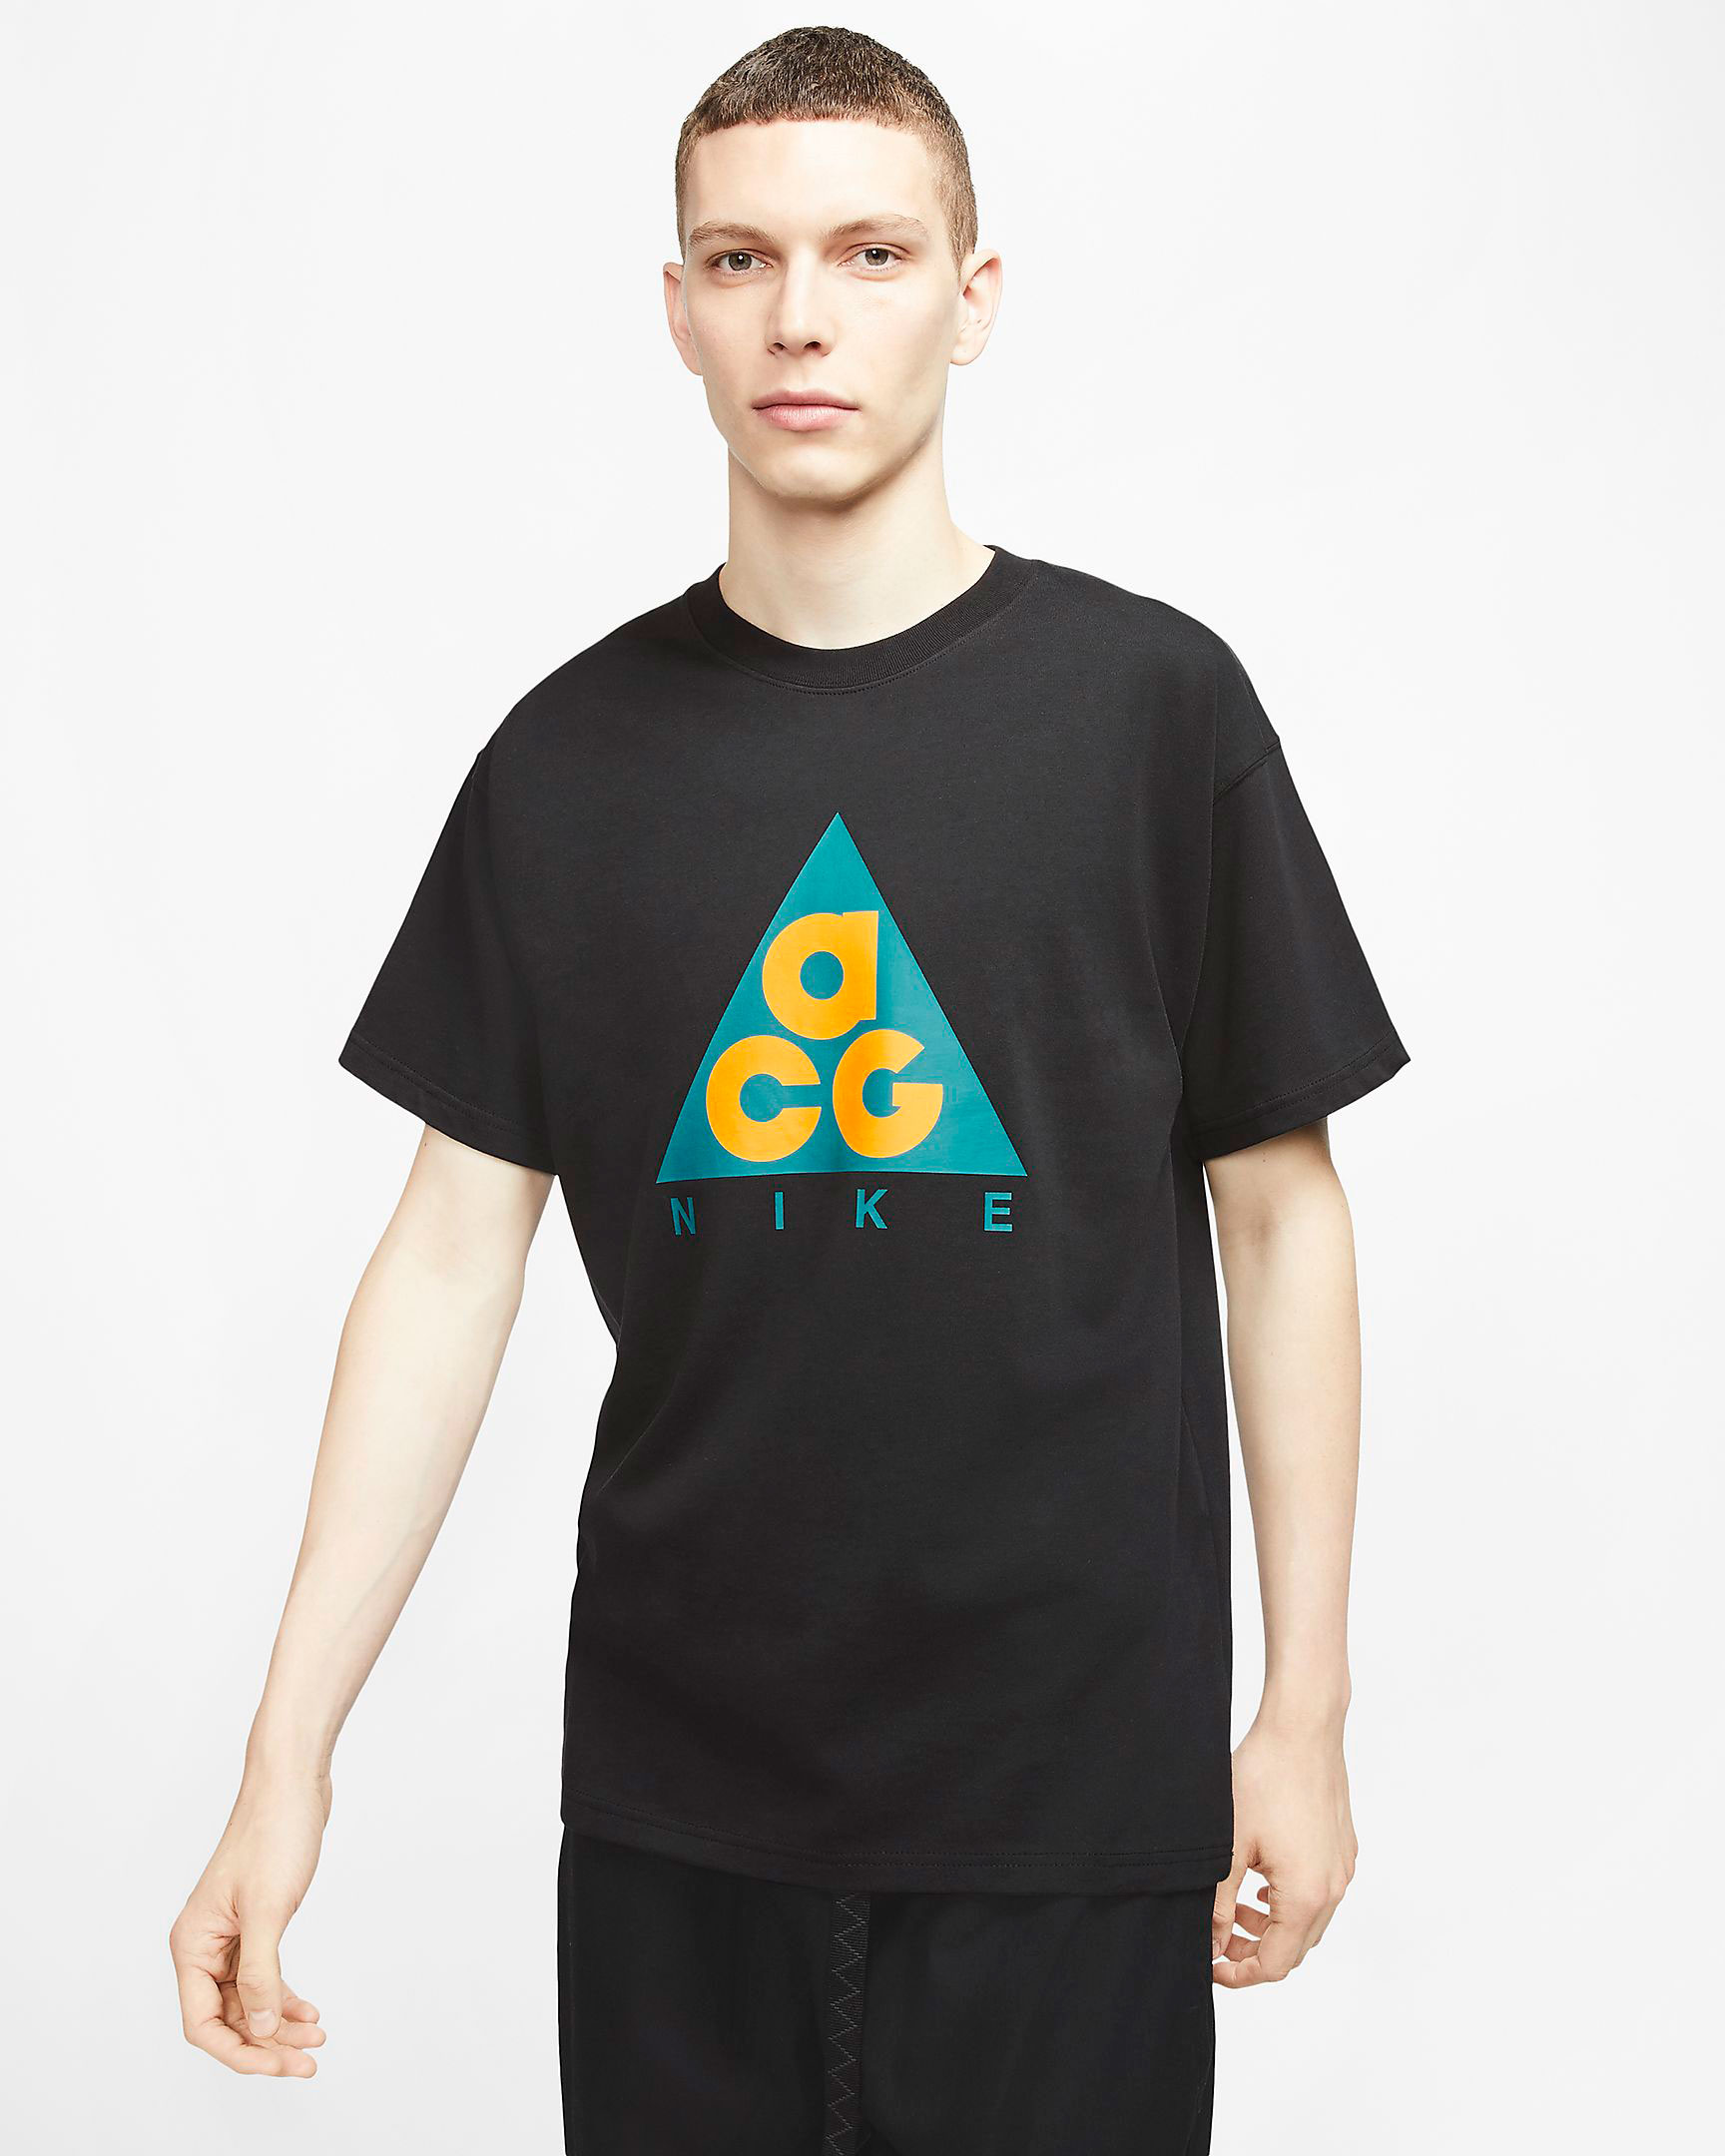 nike-acg-logo-t-shirt-black-teal